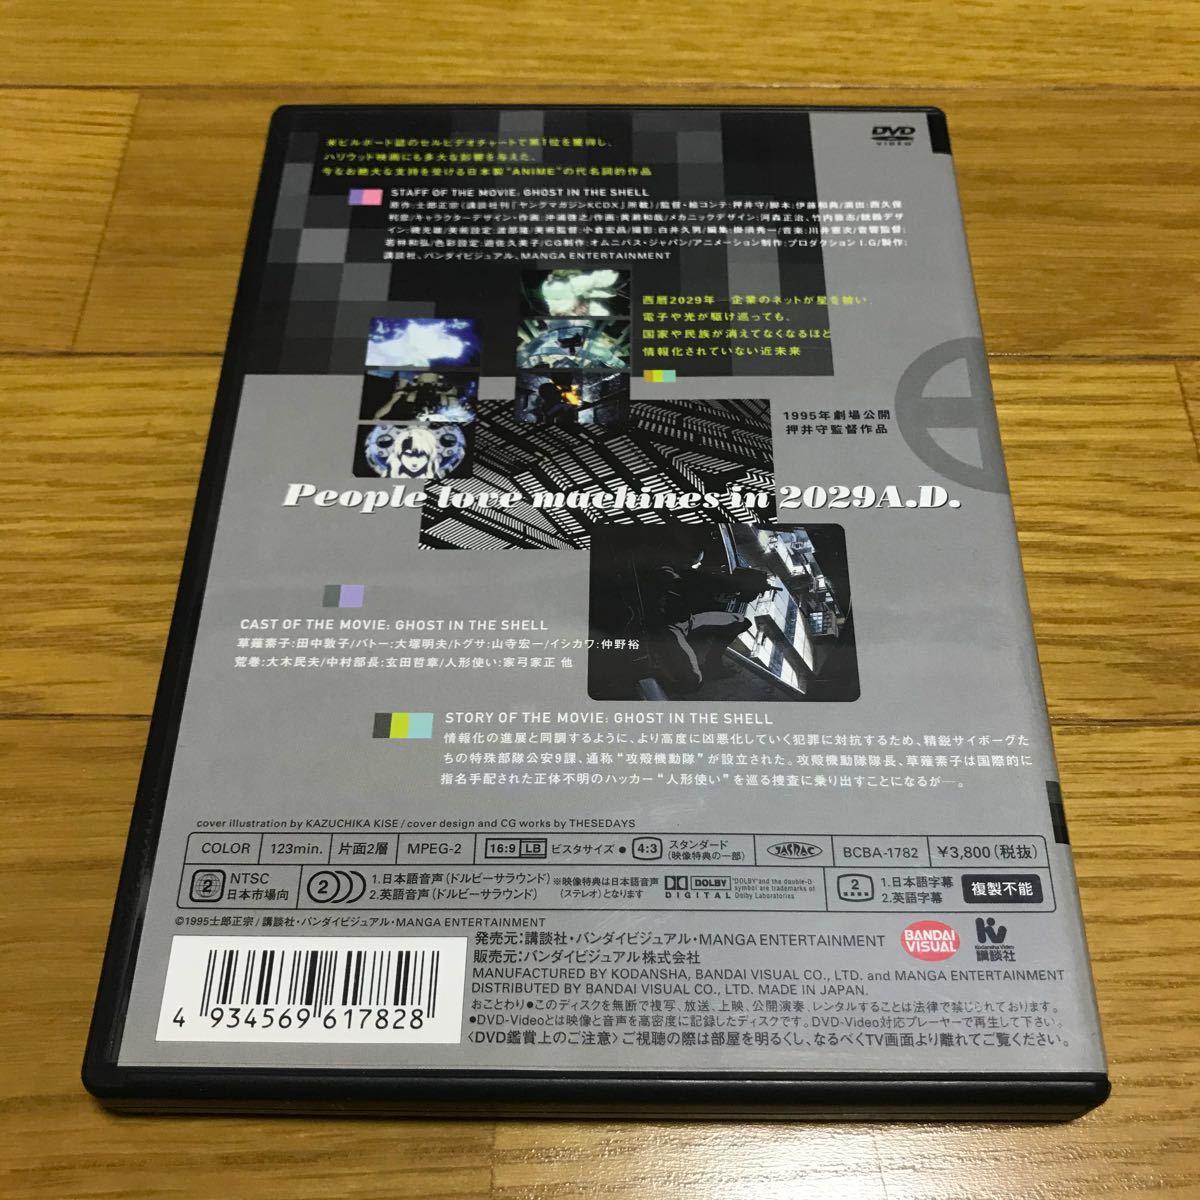 GHOST IN THE SHELL 攻殻機動隊('95講談社/バンダイビジュ…